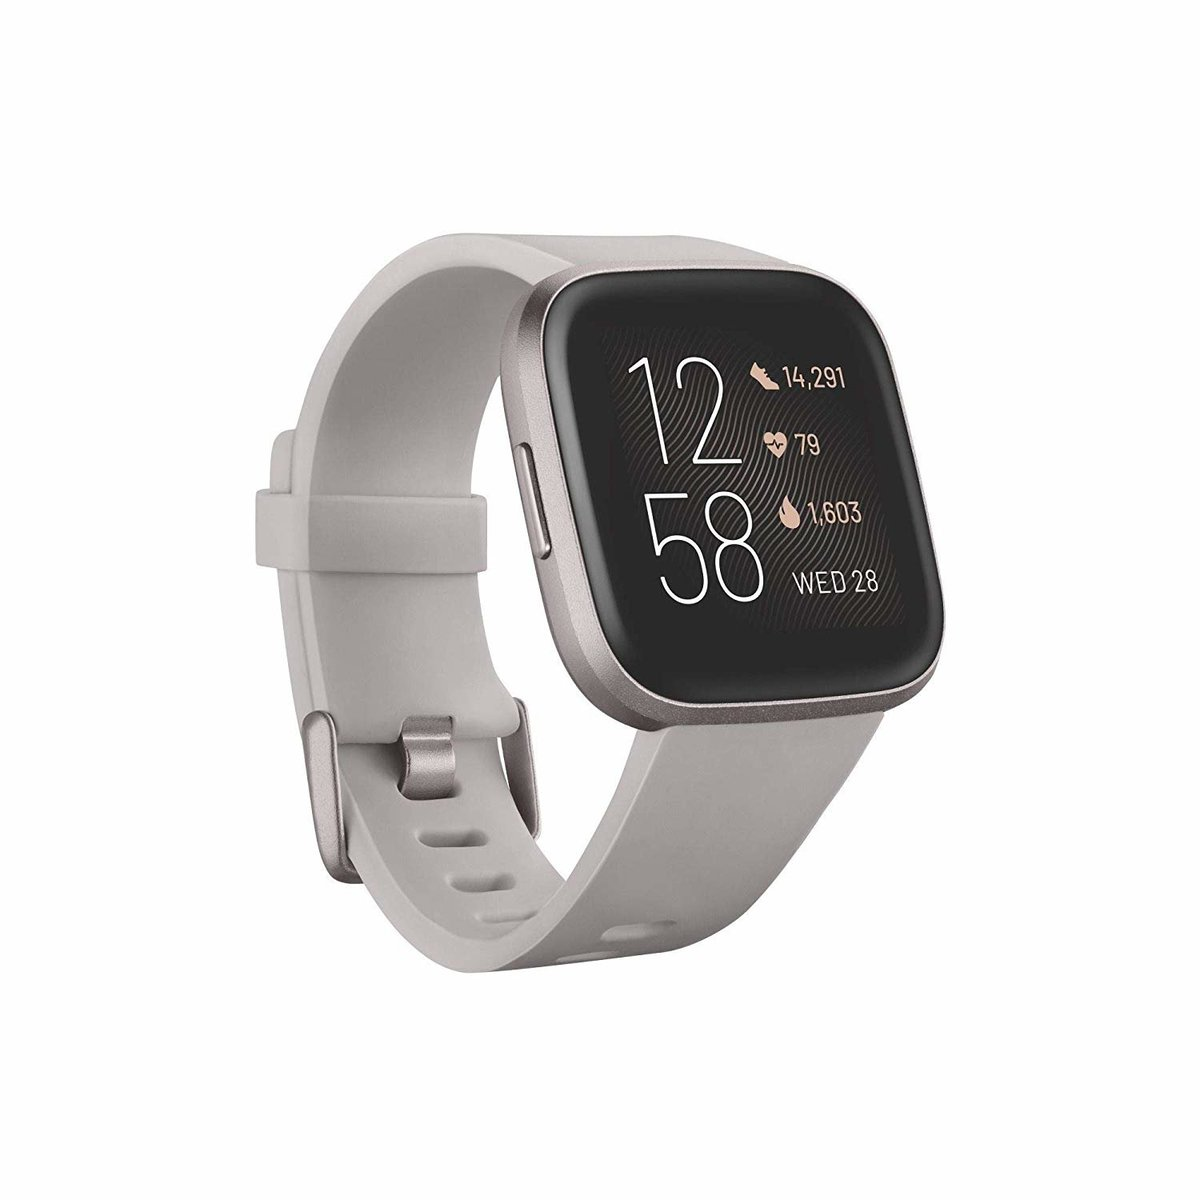 Versa 2 健康運動智慧手錶[石色/霧灰色鋁製材質]